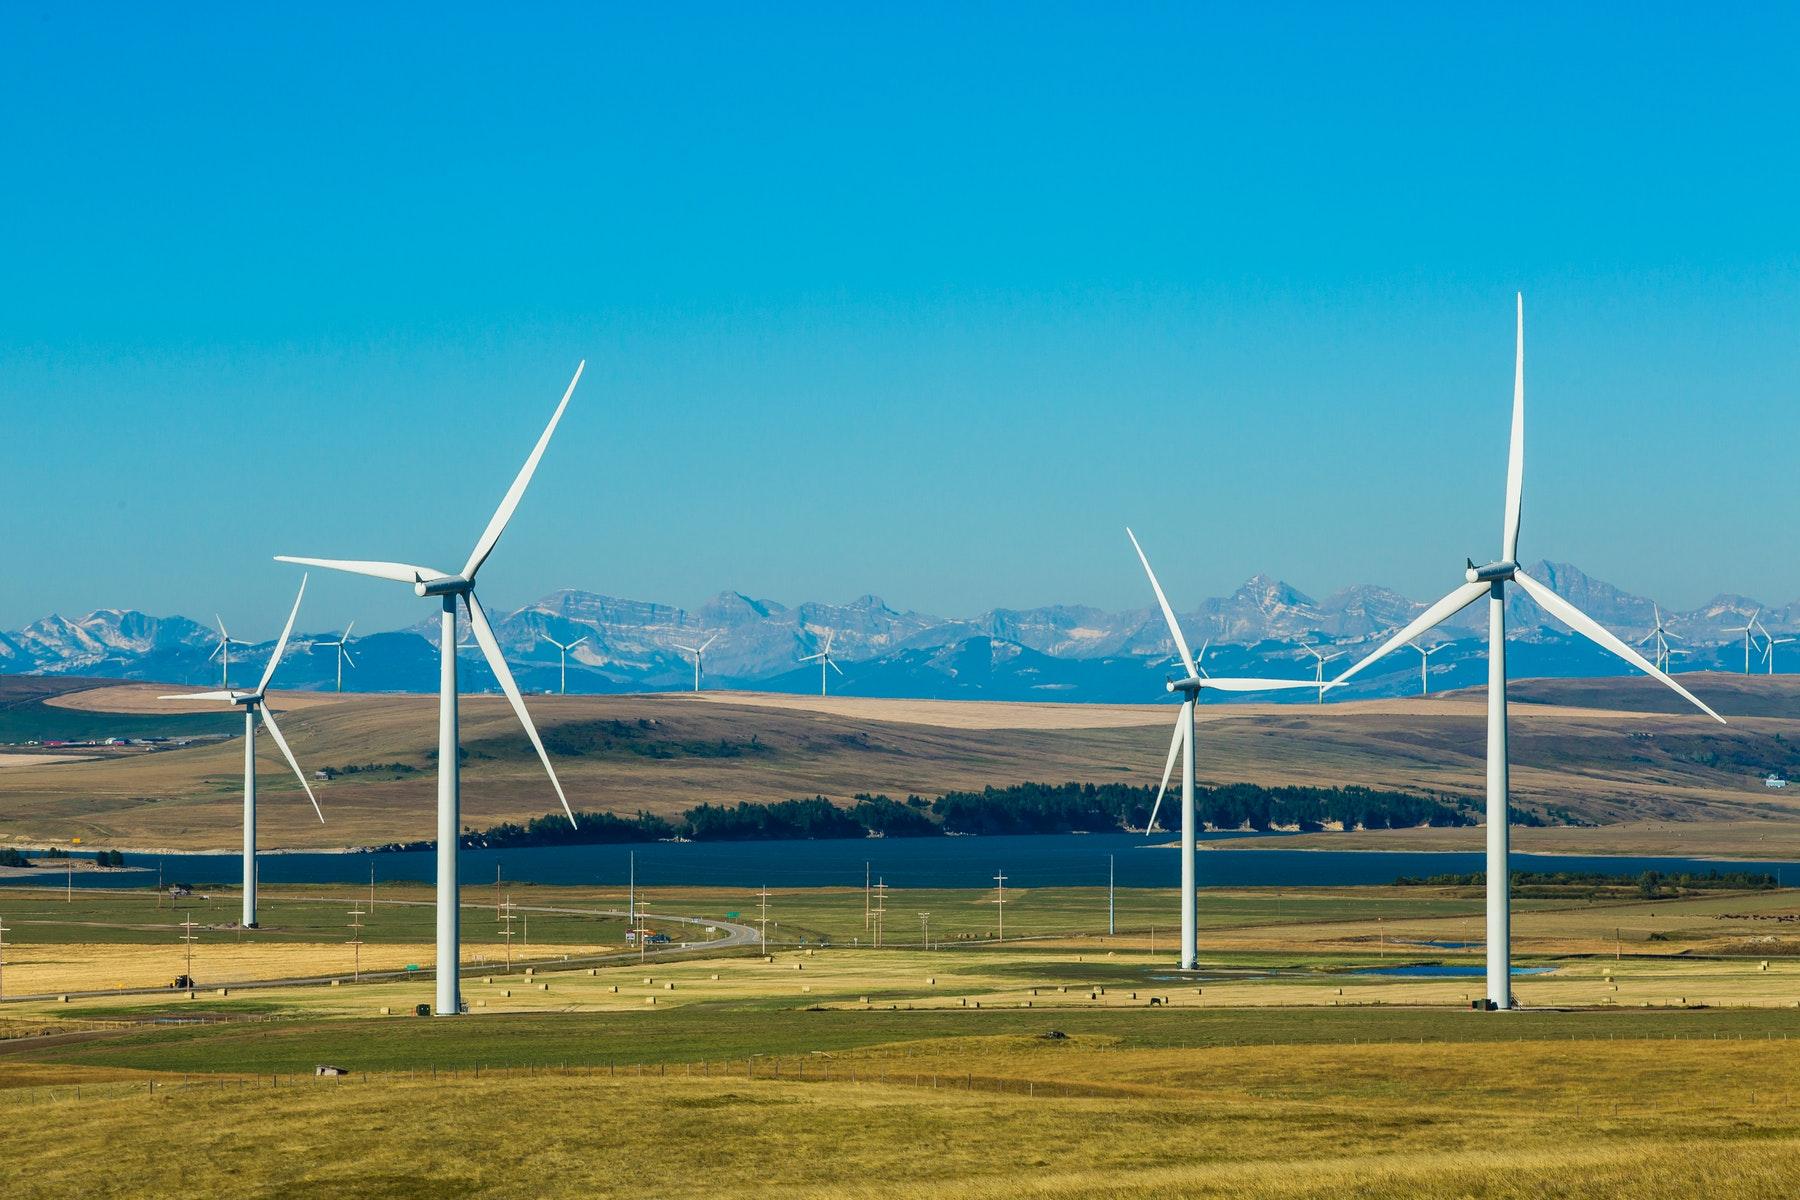 Ikea's wind farm